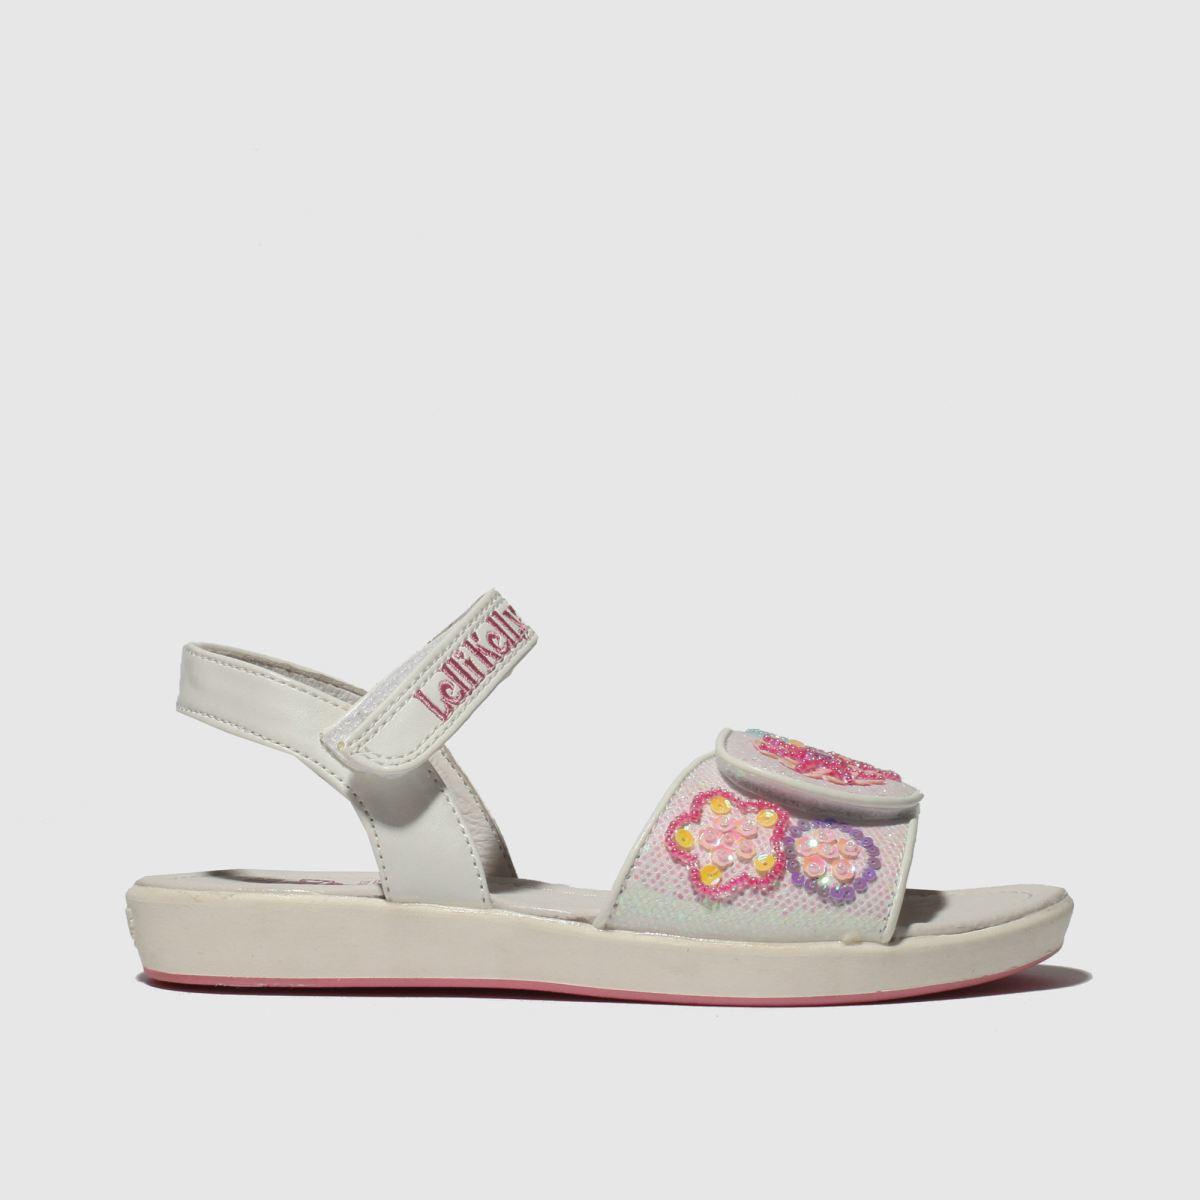 Lelli Kelly White & Pink Daisy Sandals Junior